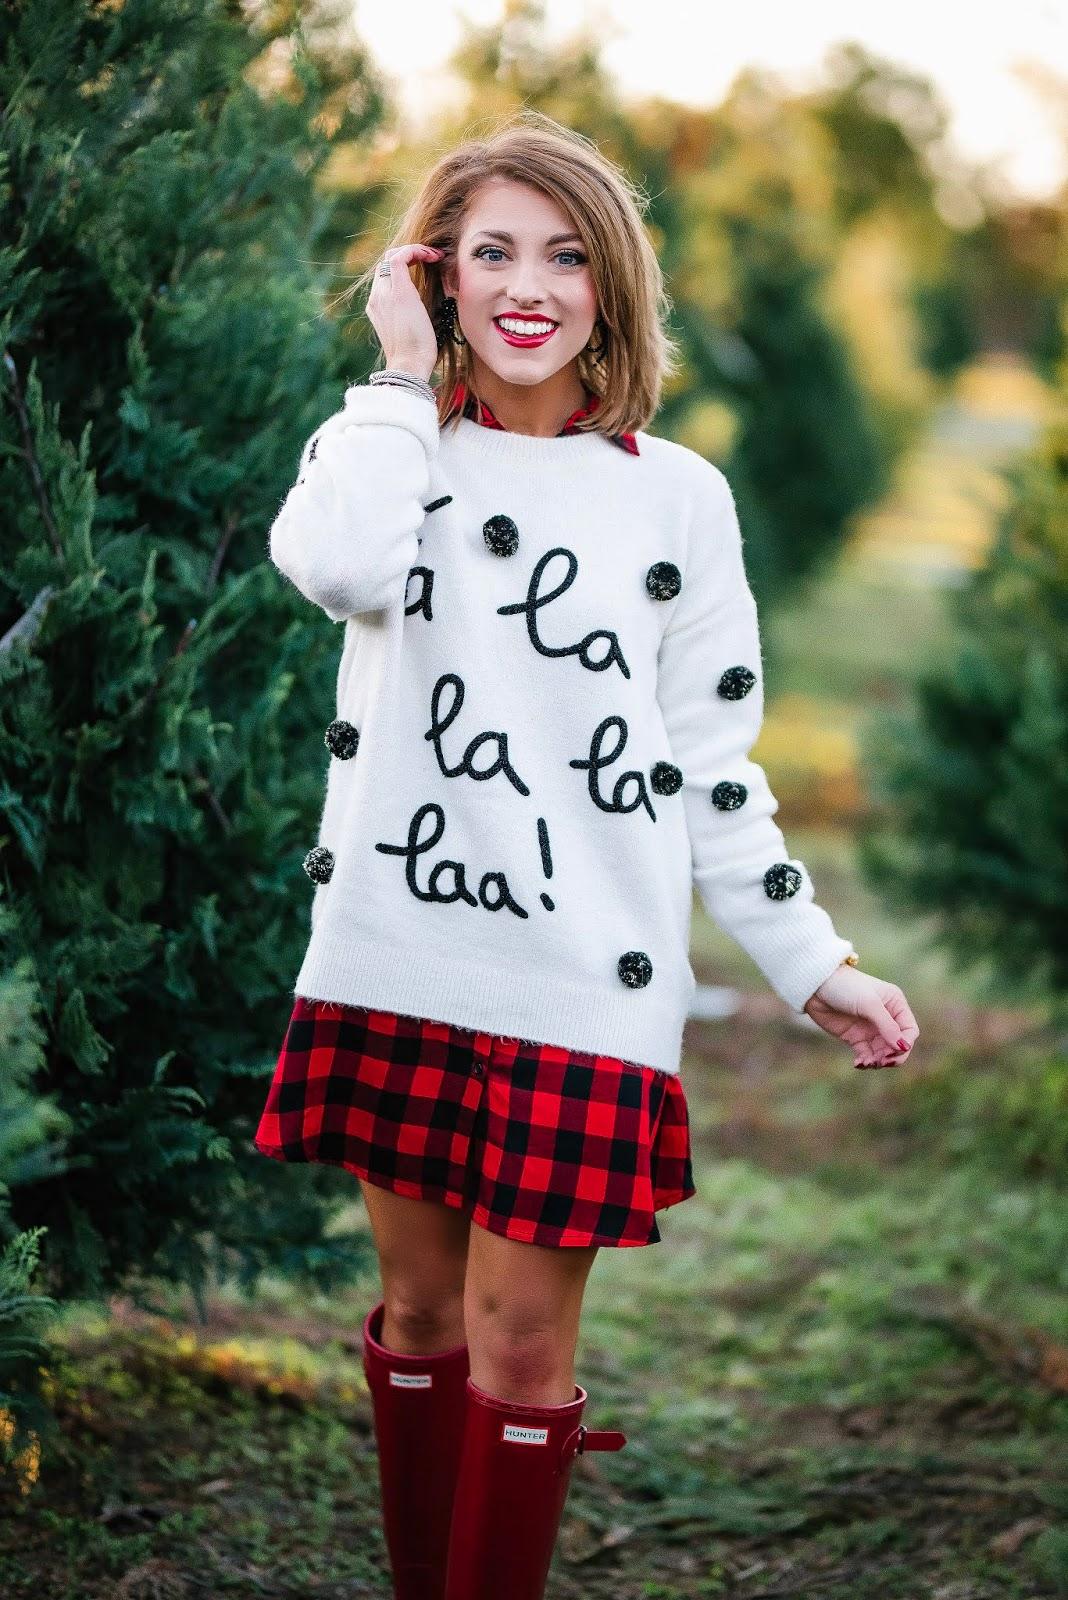 Buffalo Plaid Dress, Fa La La La Sweater & Hunter Boots + Gift Guide for the Pet Lovers - Something Delightful Blog